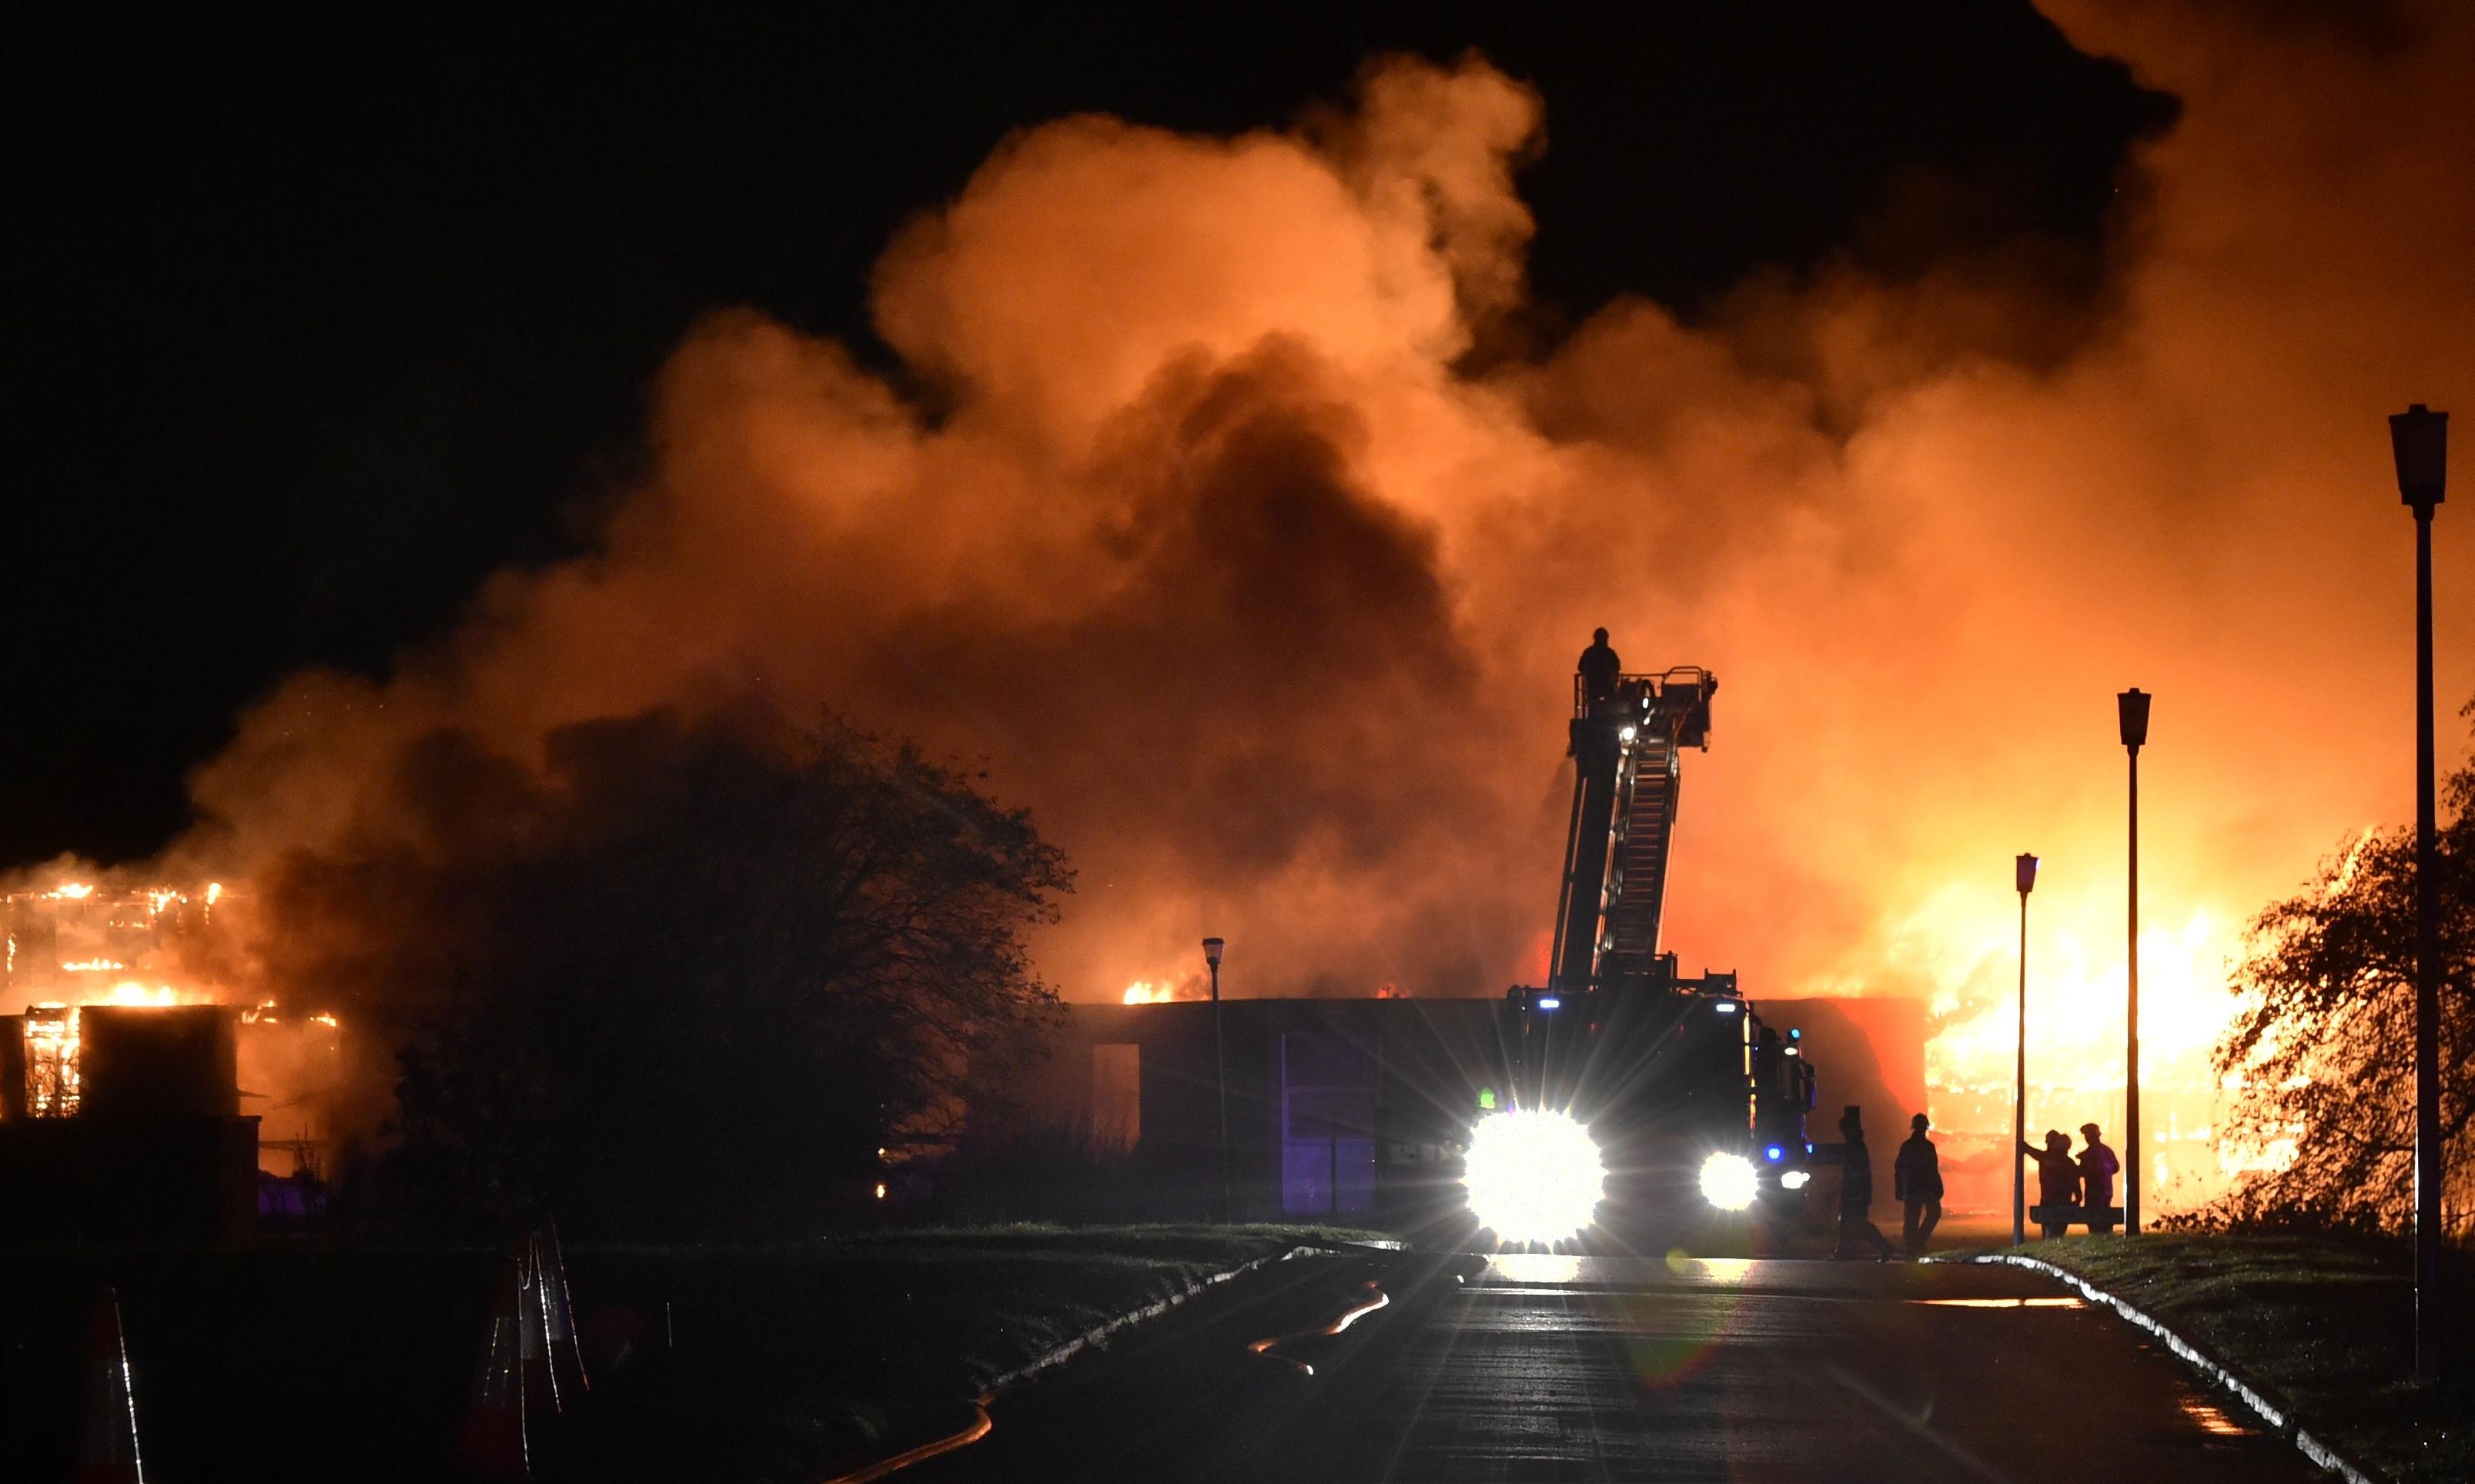 The blaze at Cordyce School